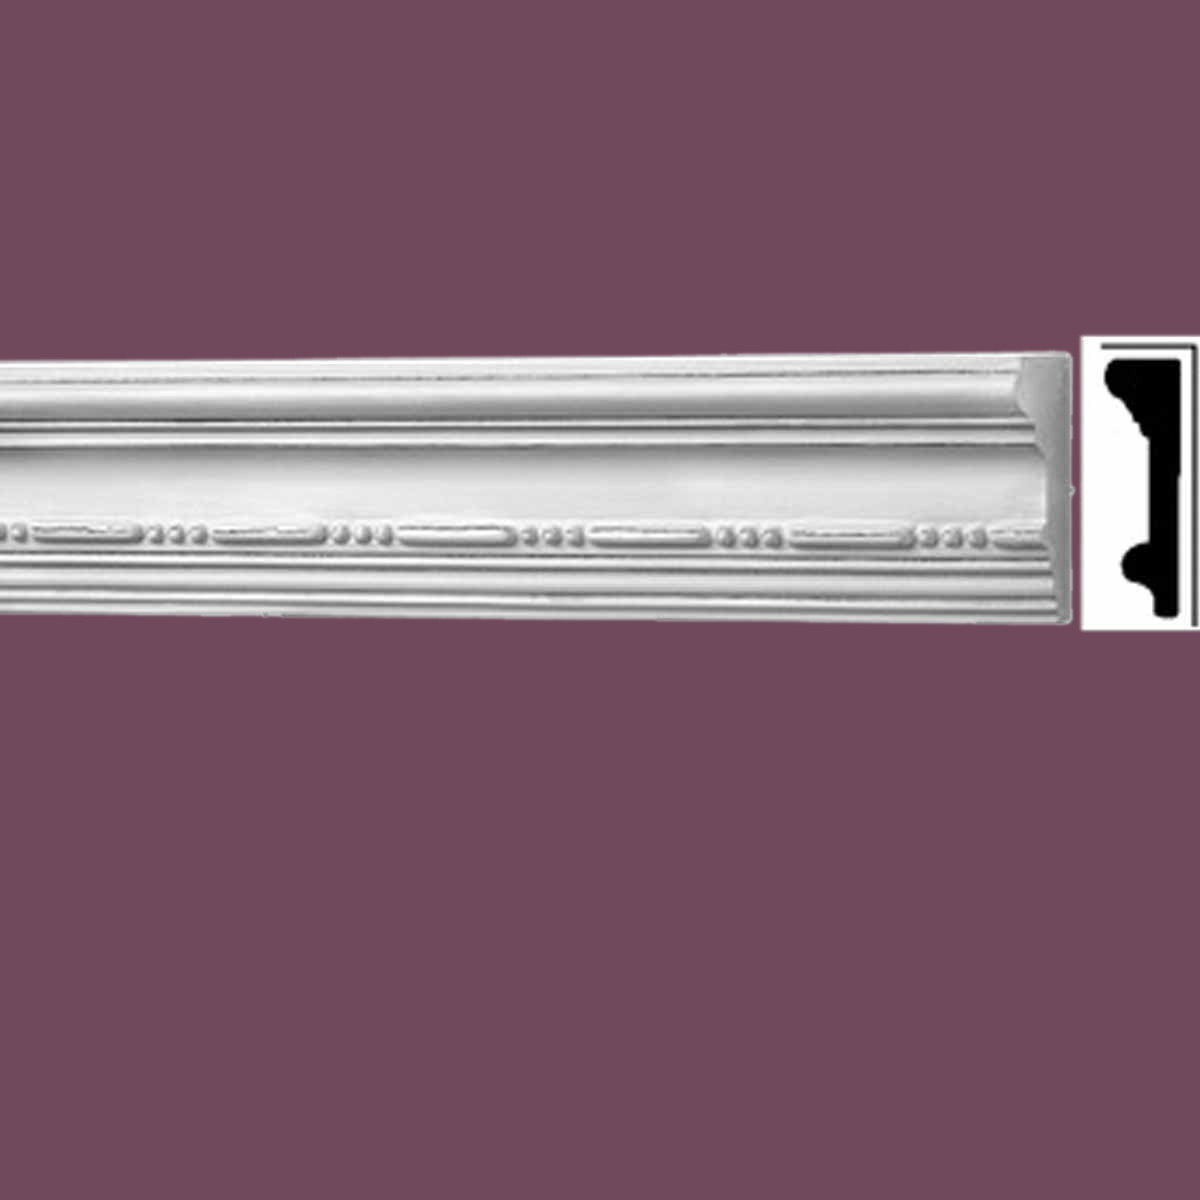 Cornice White Urethane Sample of 20403 19.75 Long Cornice Cornice Moulding Cornice Molding